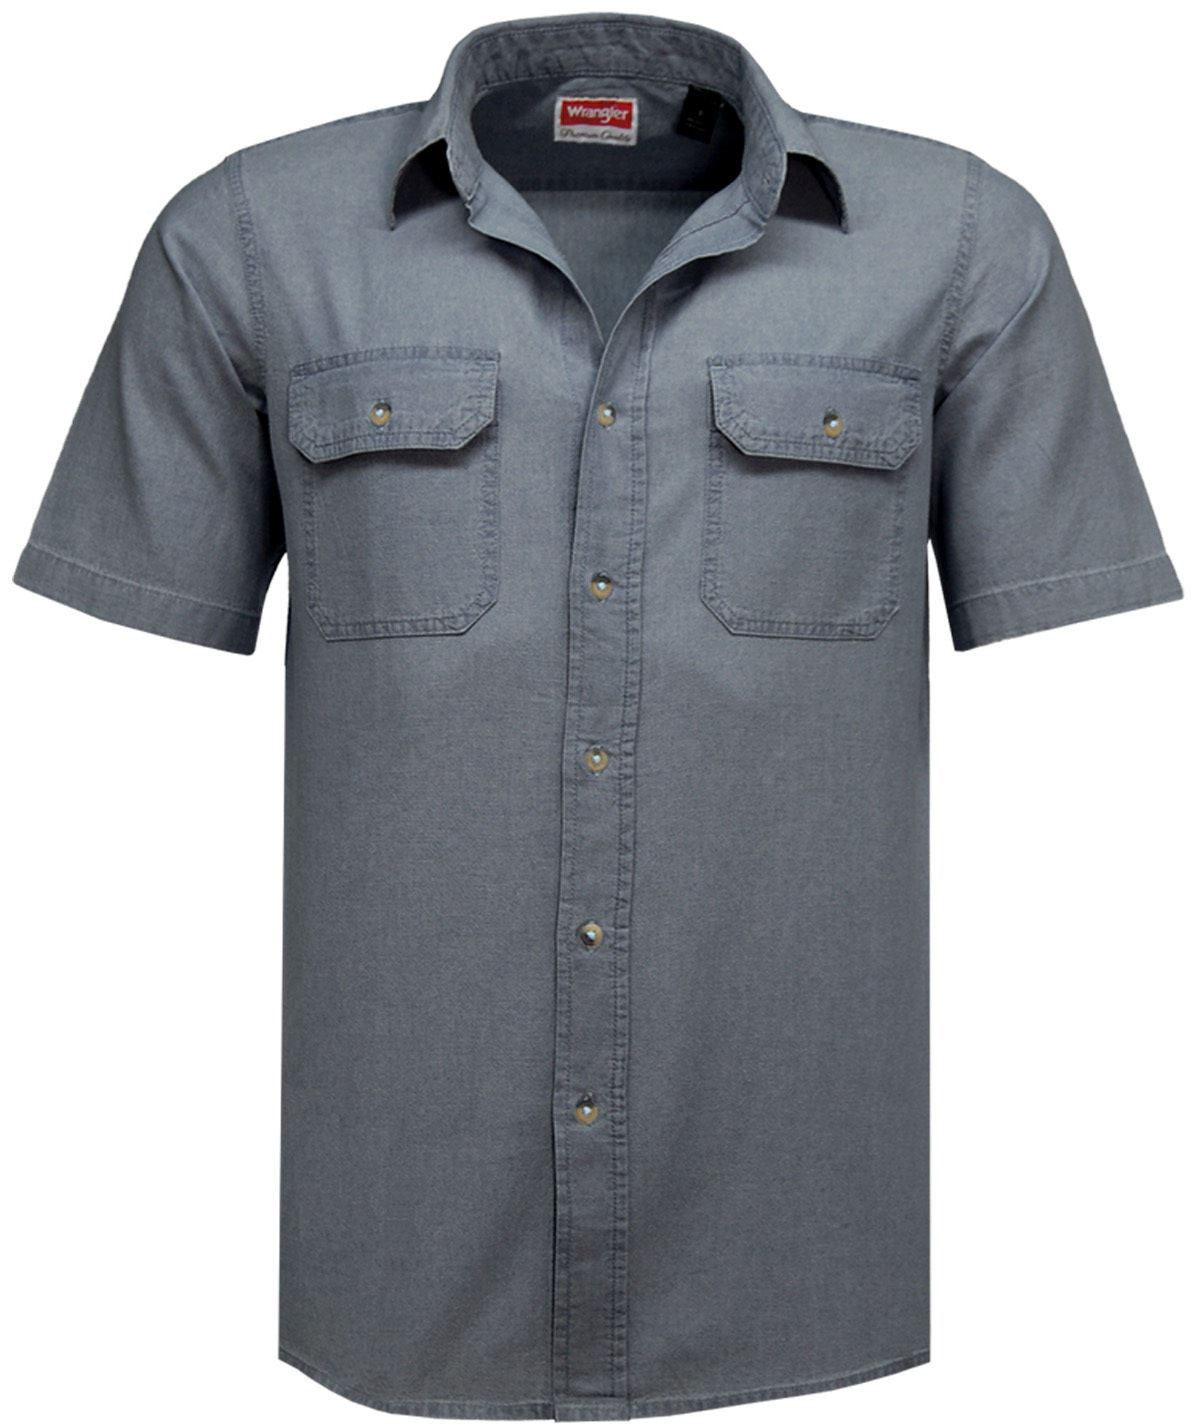 Mens wrangler denim shirt casual vintage formal work shirt for Wrangler denim shirts uk